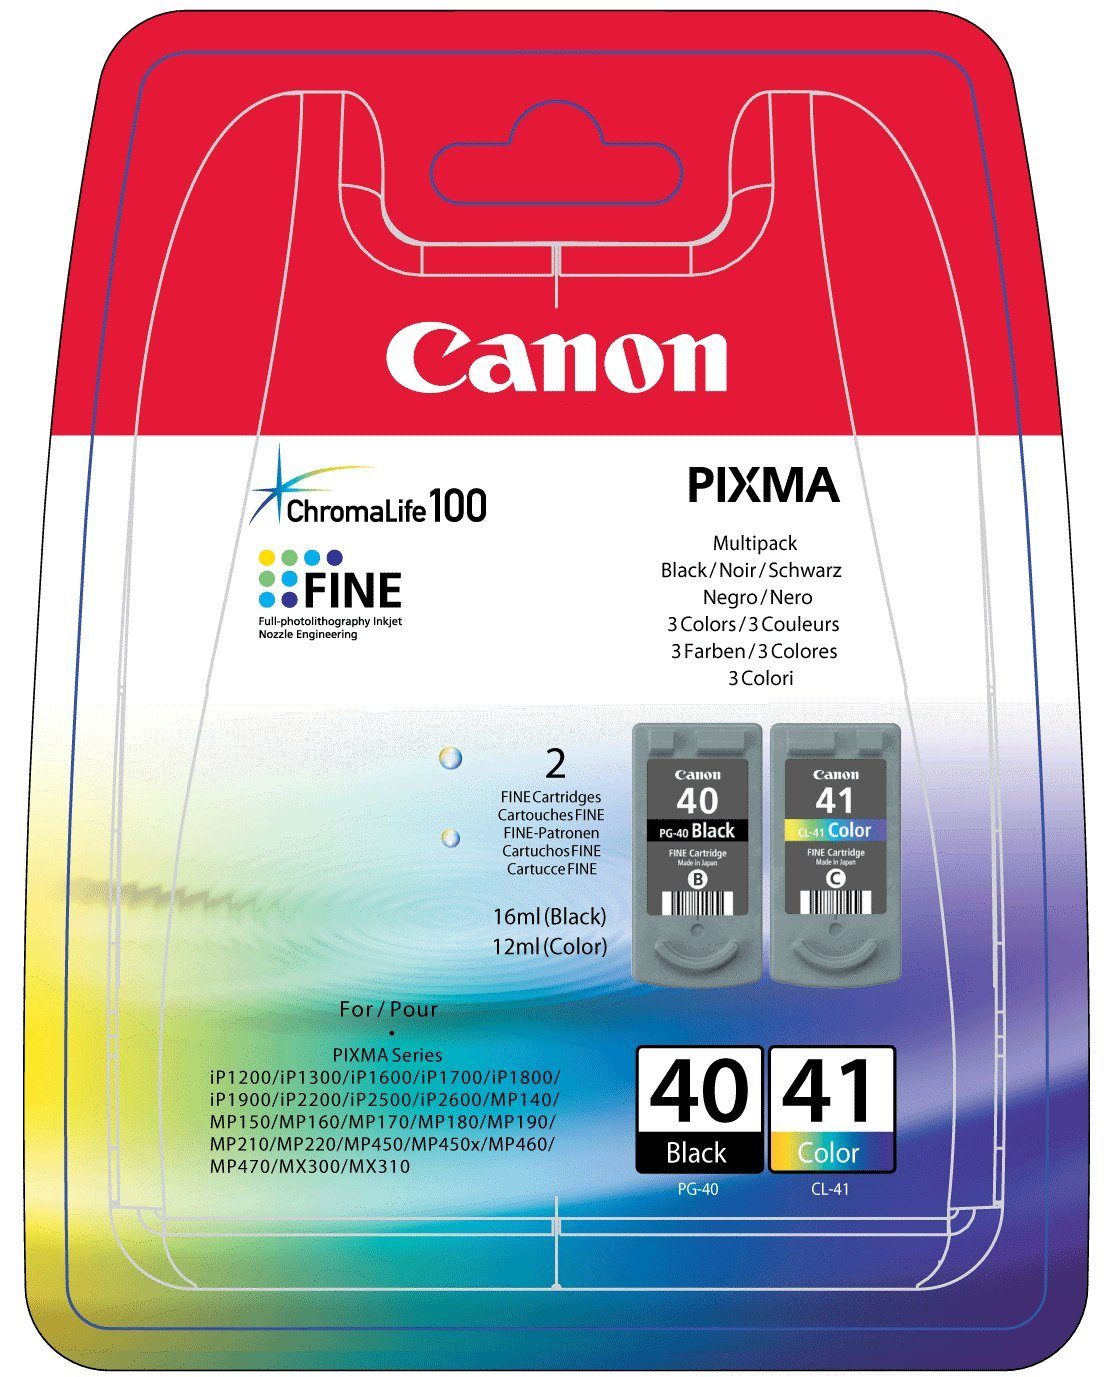 CANON PG-40/CL-41 Multi Pack Incl. 2 Cartridges (PG-40/CL-41)